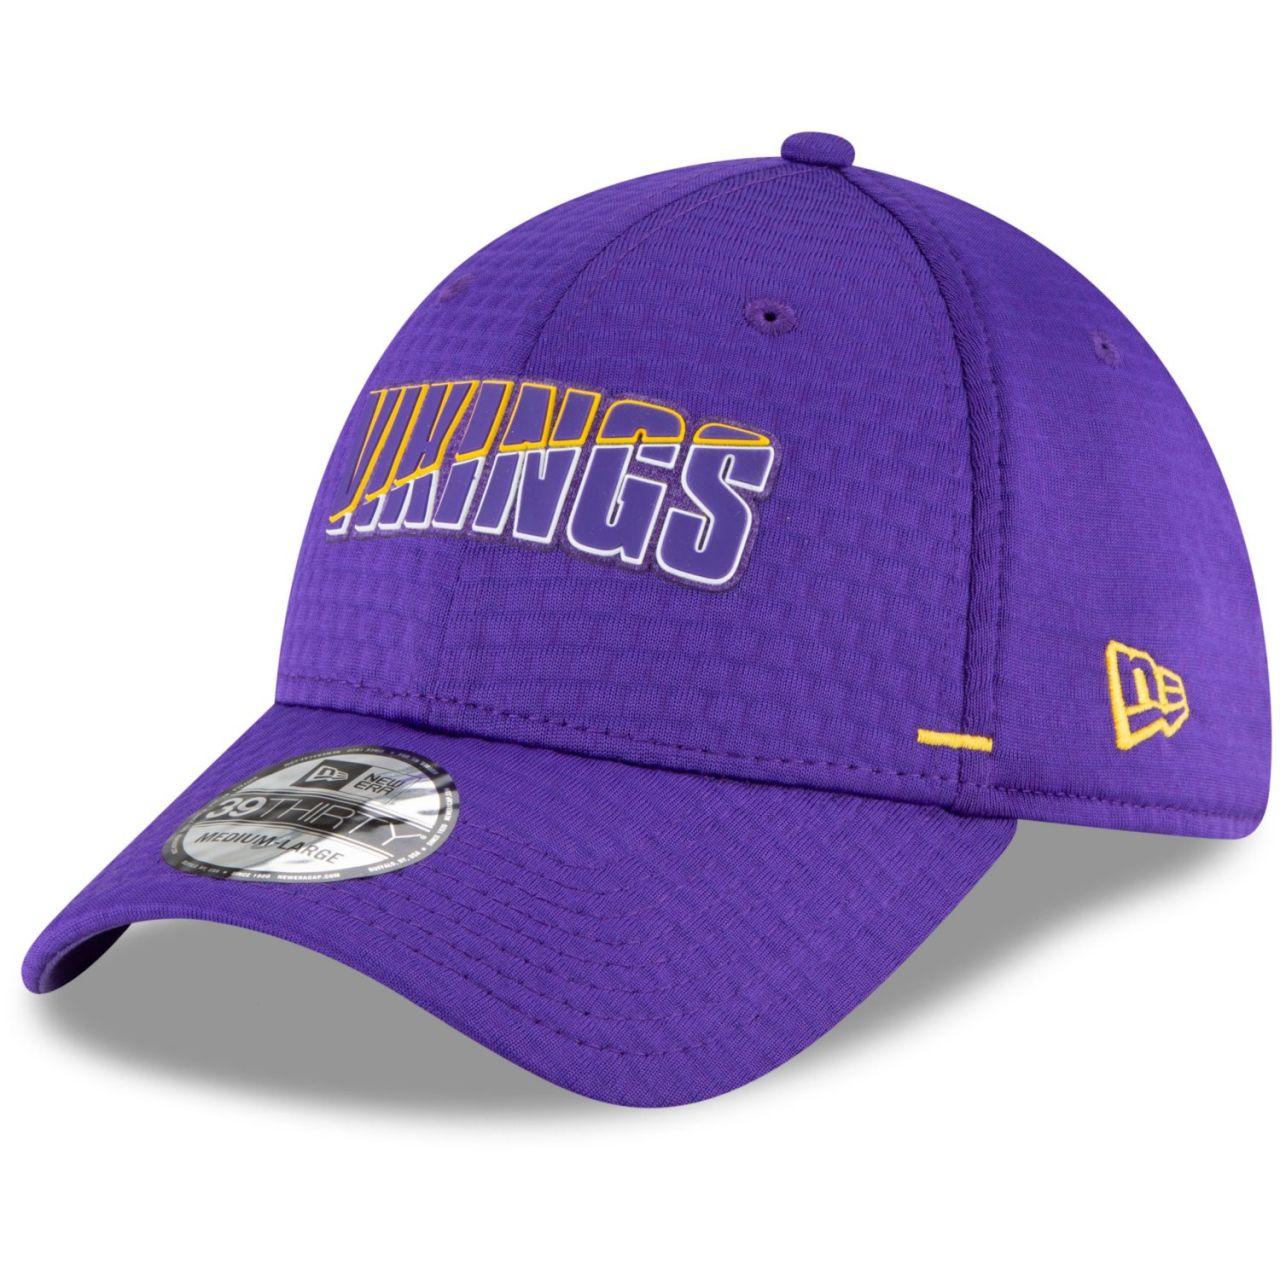 amfoo - New Era 39Thirty Cap - NFL Training Camp Minnesota Vikings